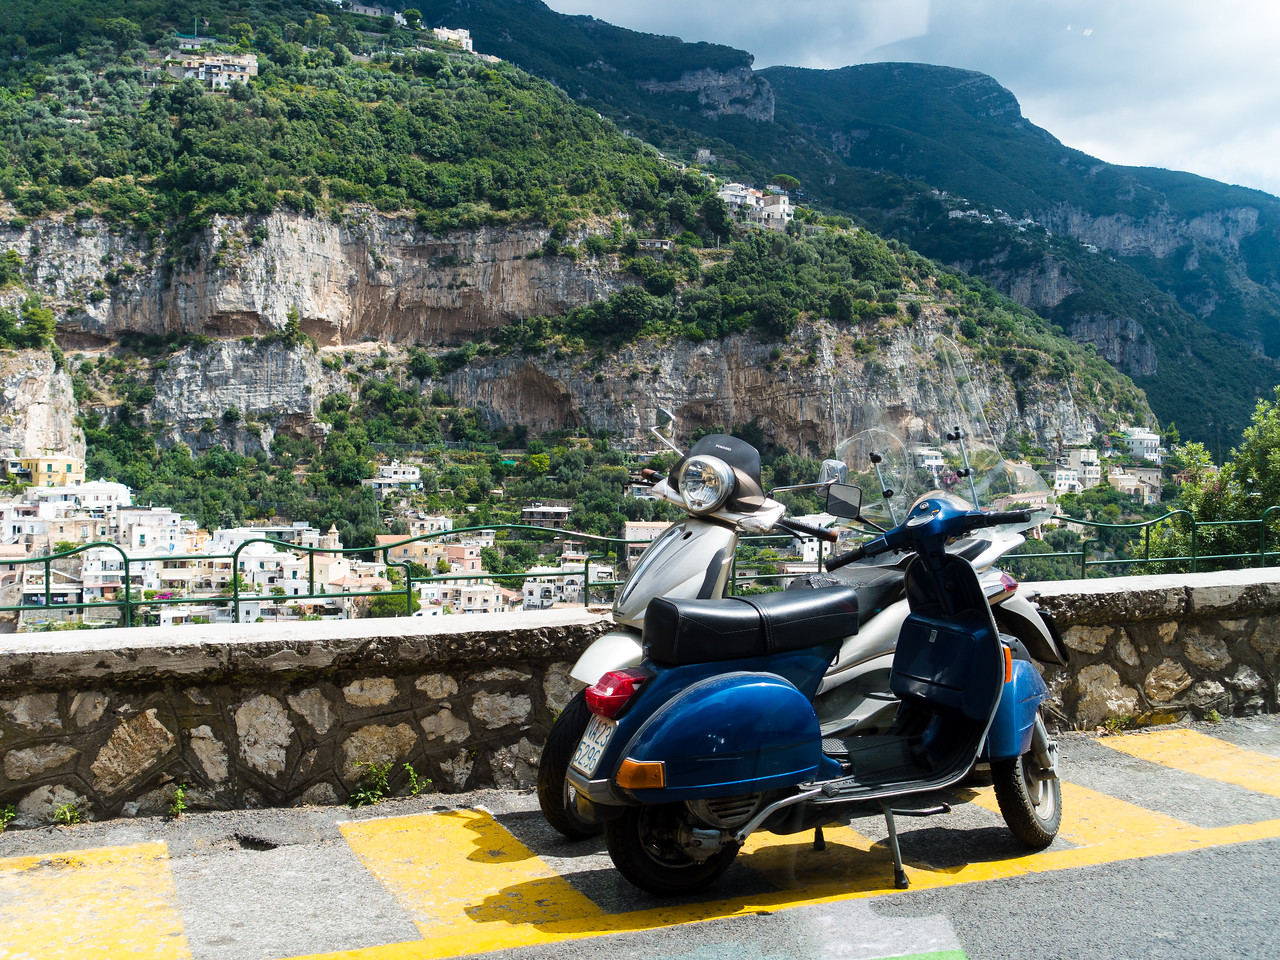 Vespas and the Amalfi coast